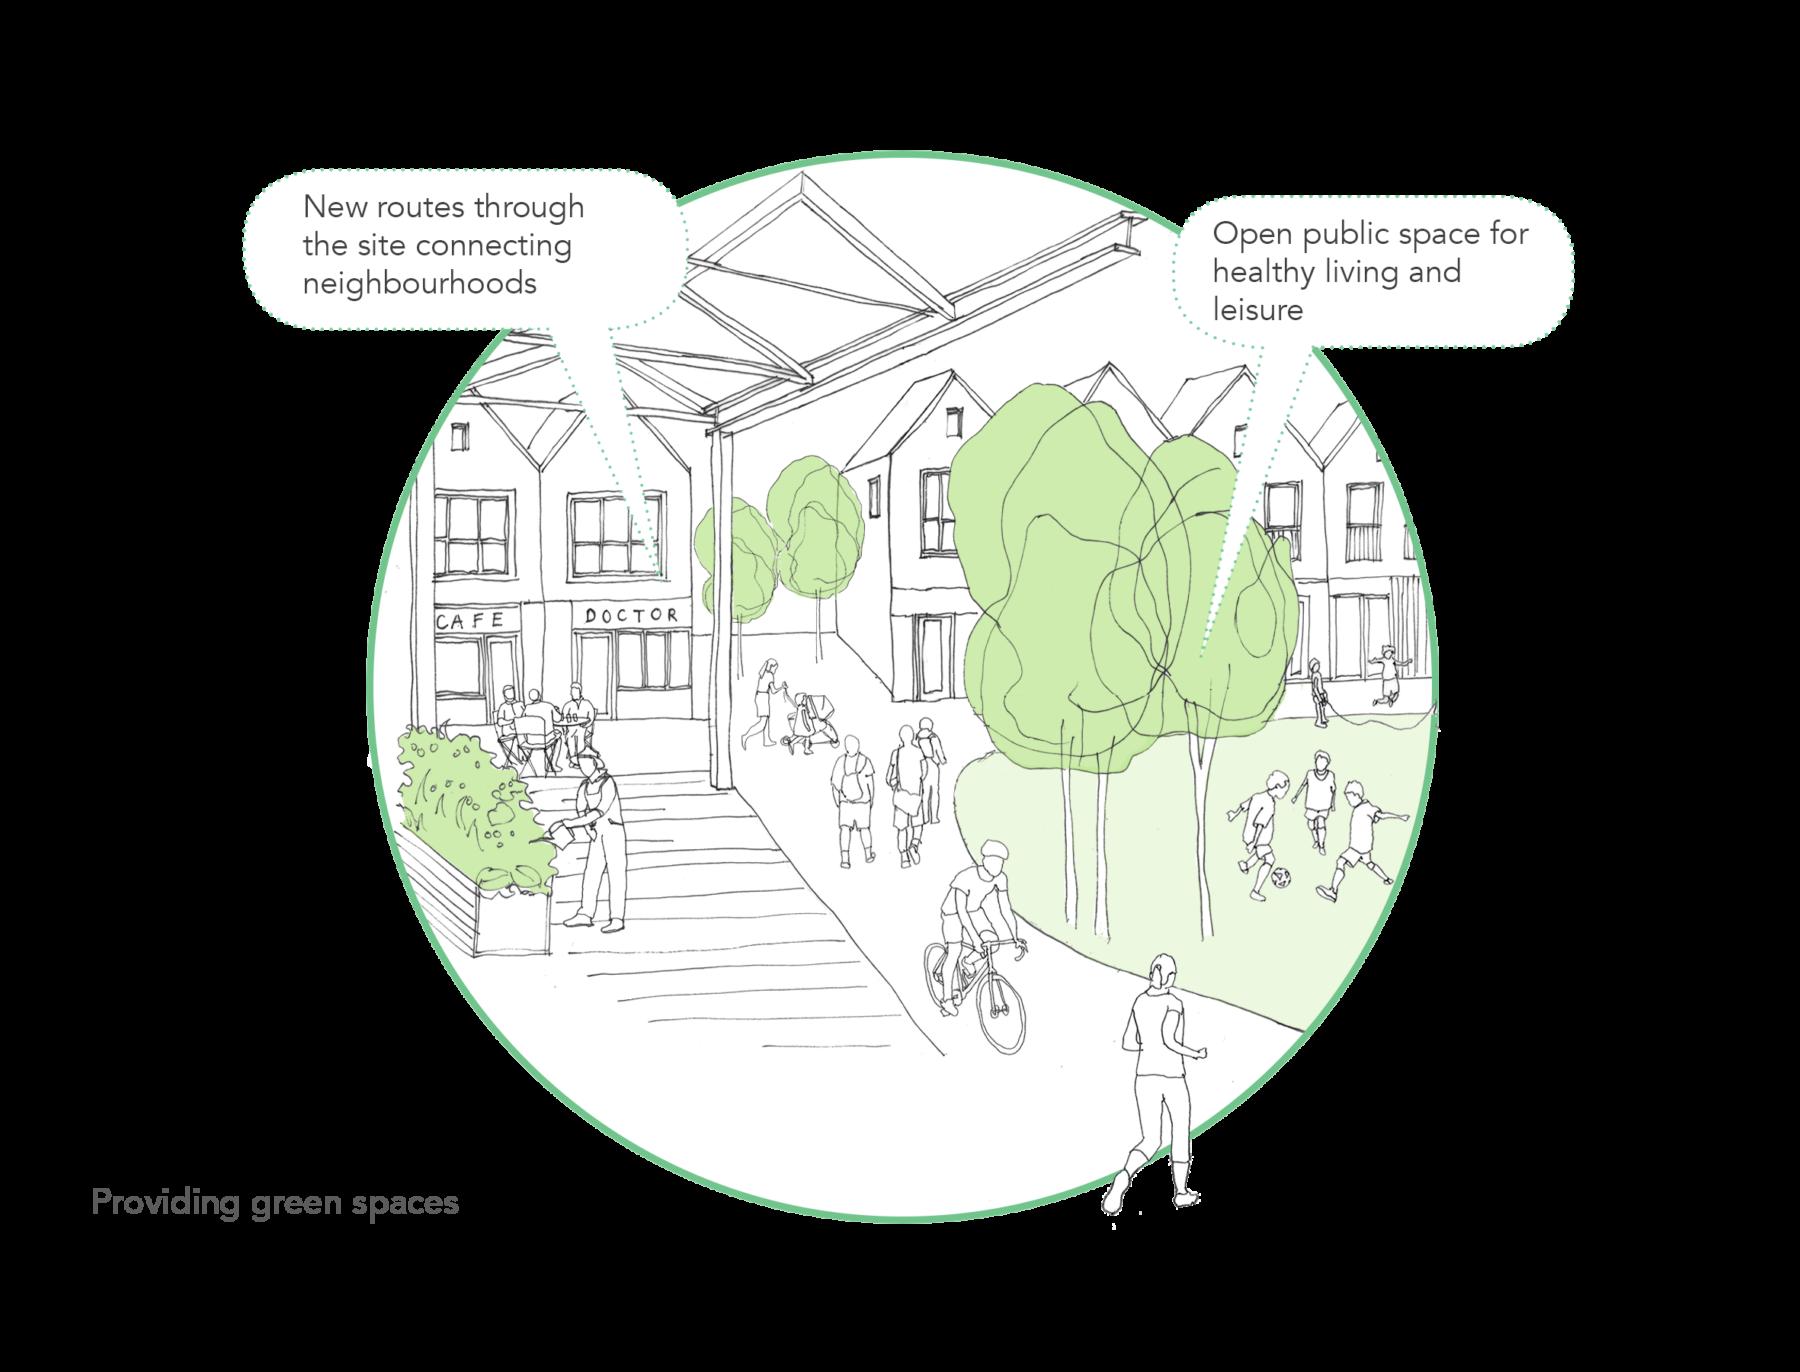 Sarah-Wigglesworth-Architects Unlocking-Pentonville Strategy-Wellbeing Diagram 1800